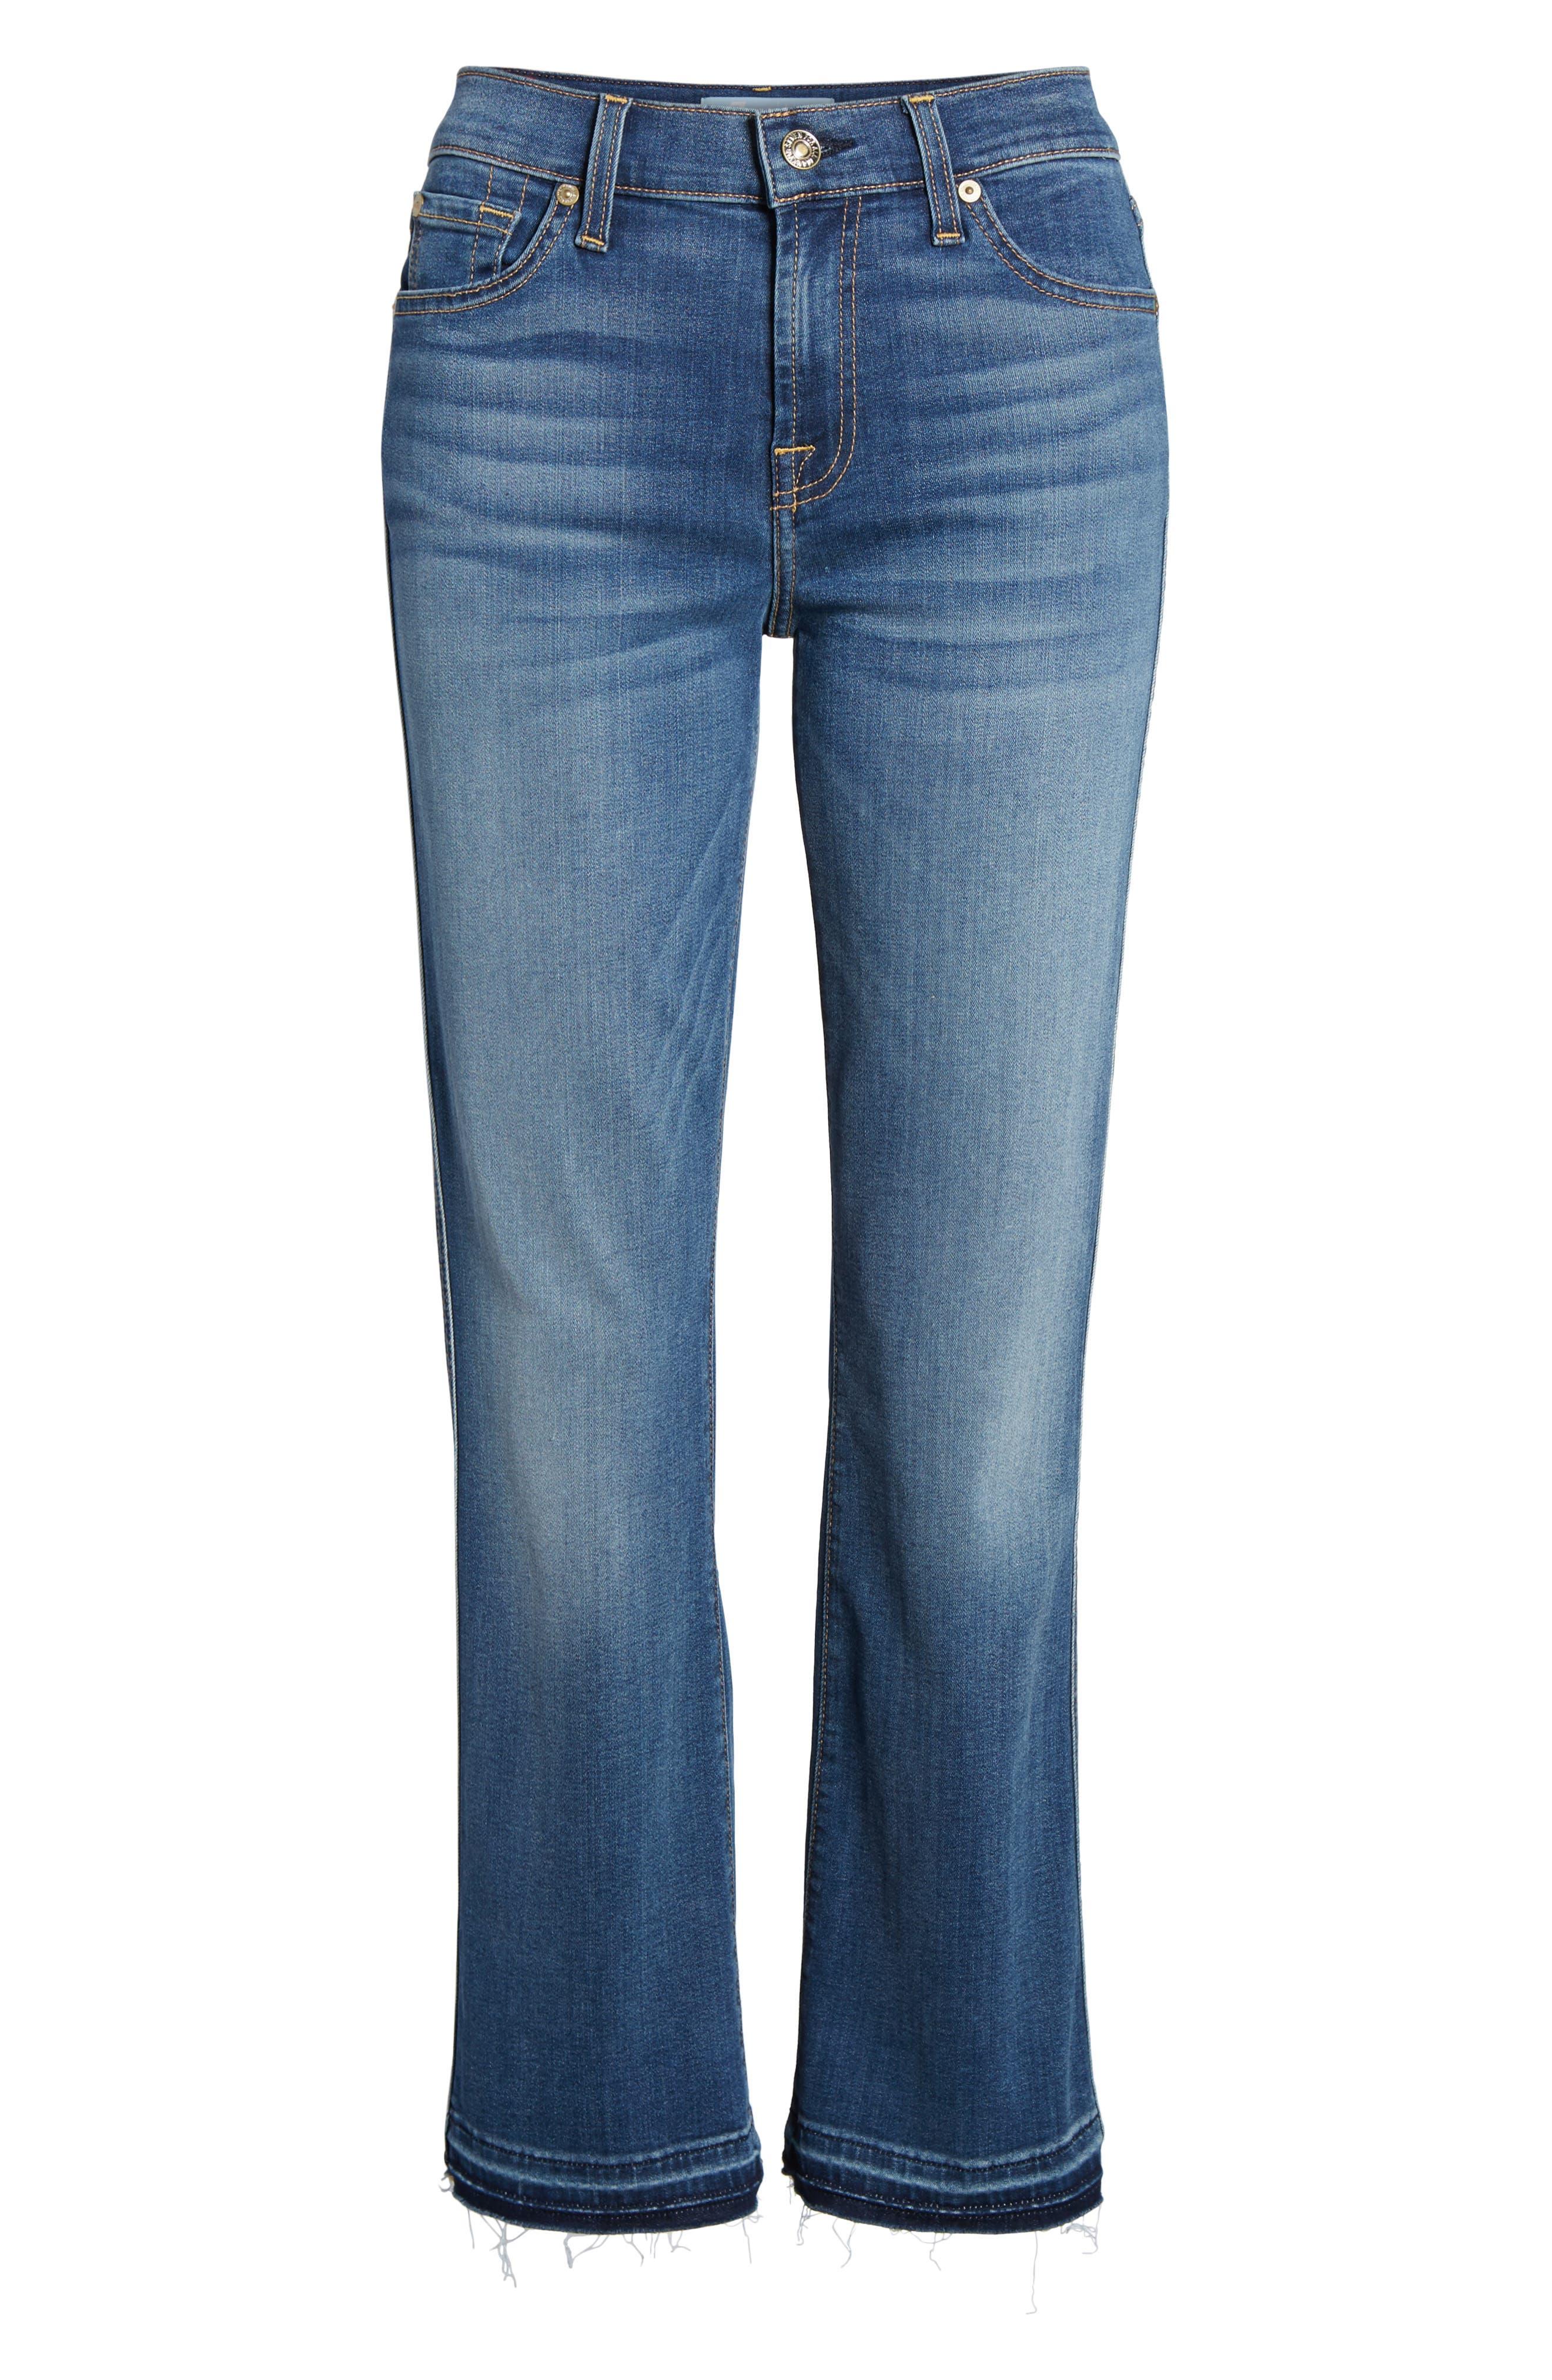 b(air) Crop Bootcut Jeans,                             Alternate thumbnail 7, color,                             BAIR VINTAGE DUSK